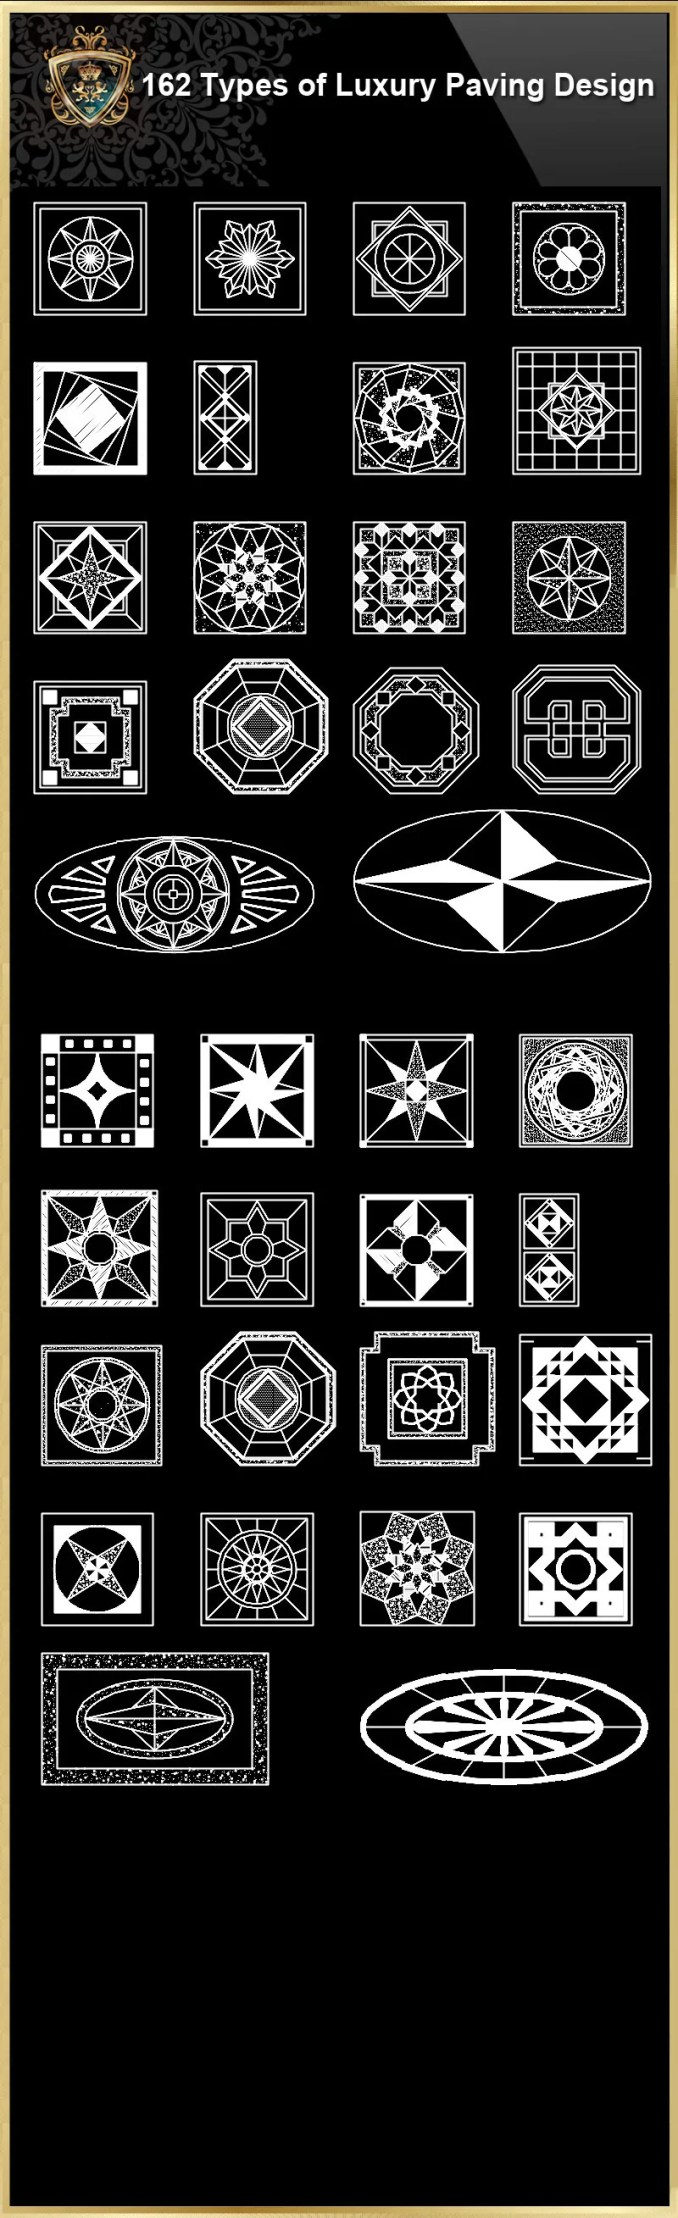 162 Types of Luxury Paving Design